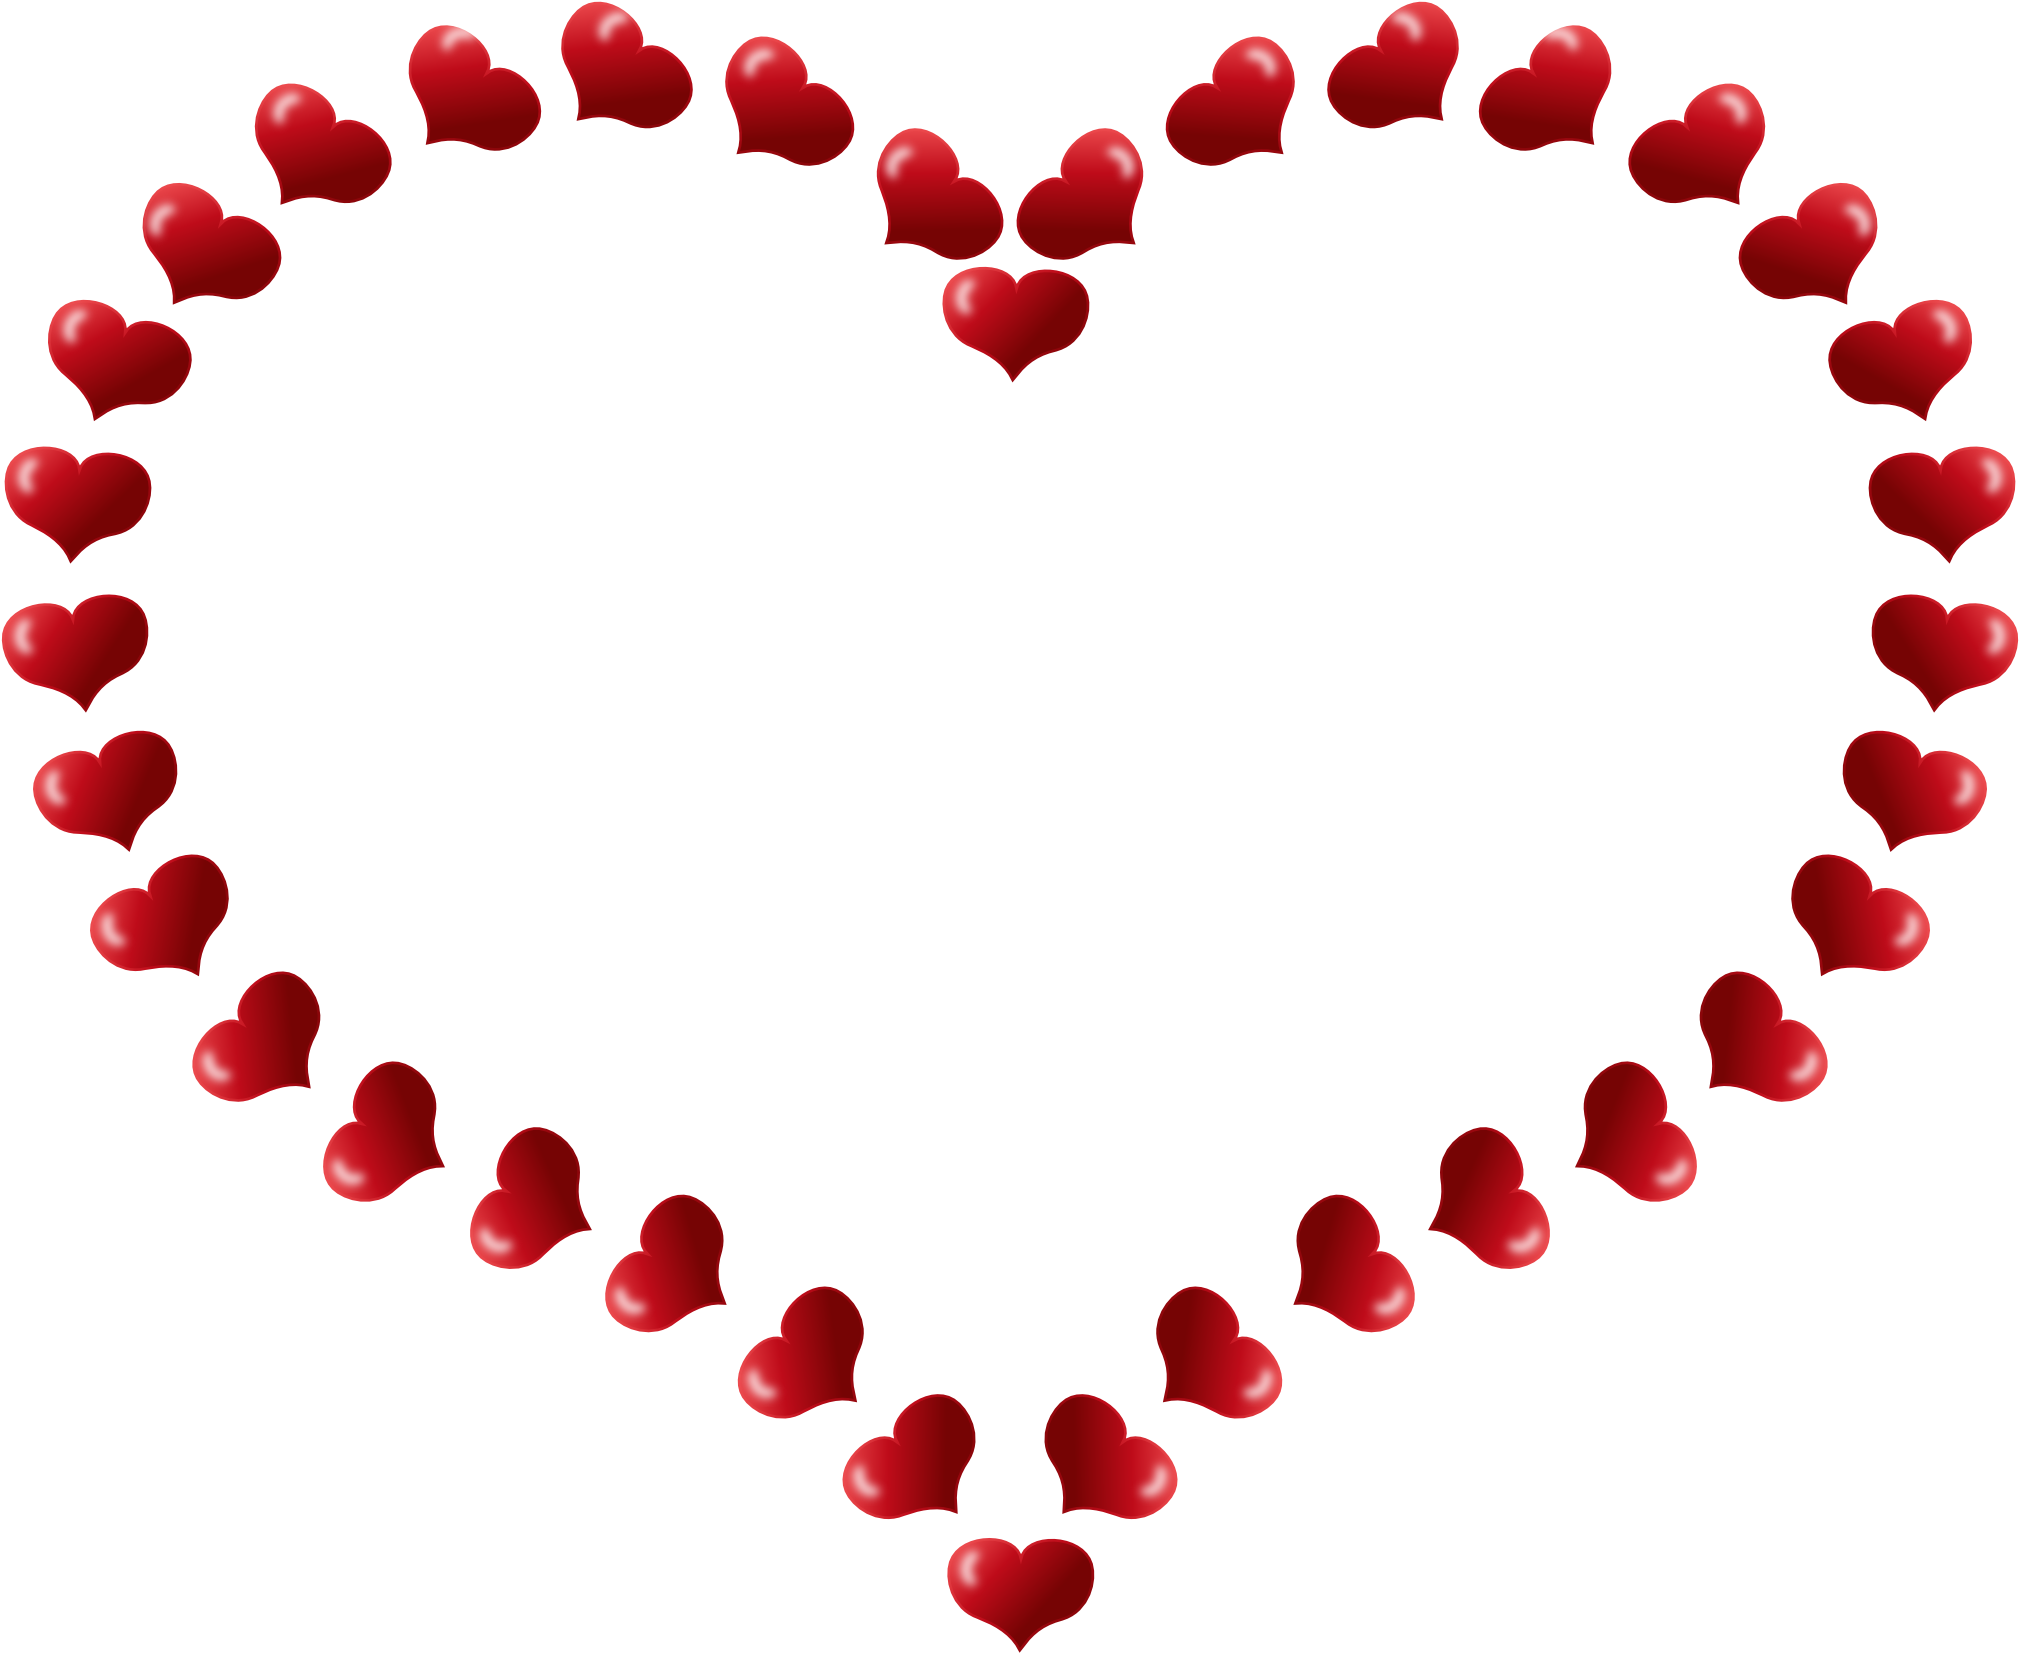 Panda clipart heart. Jokingart com download free